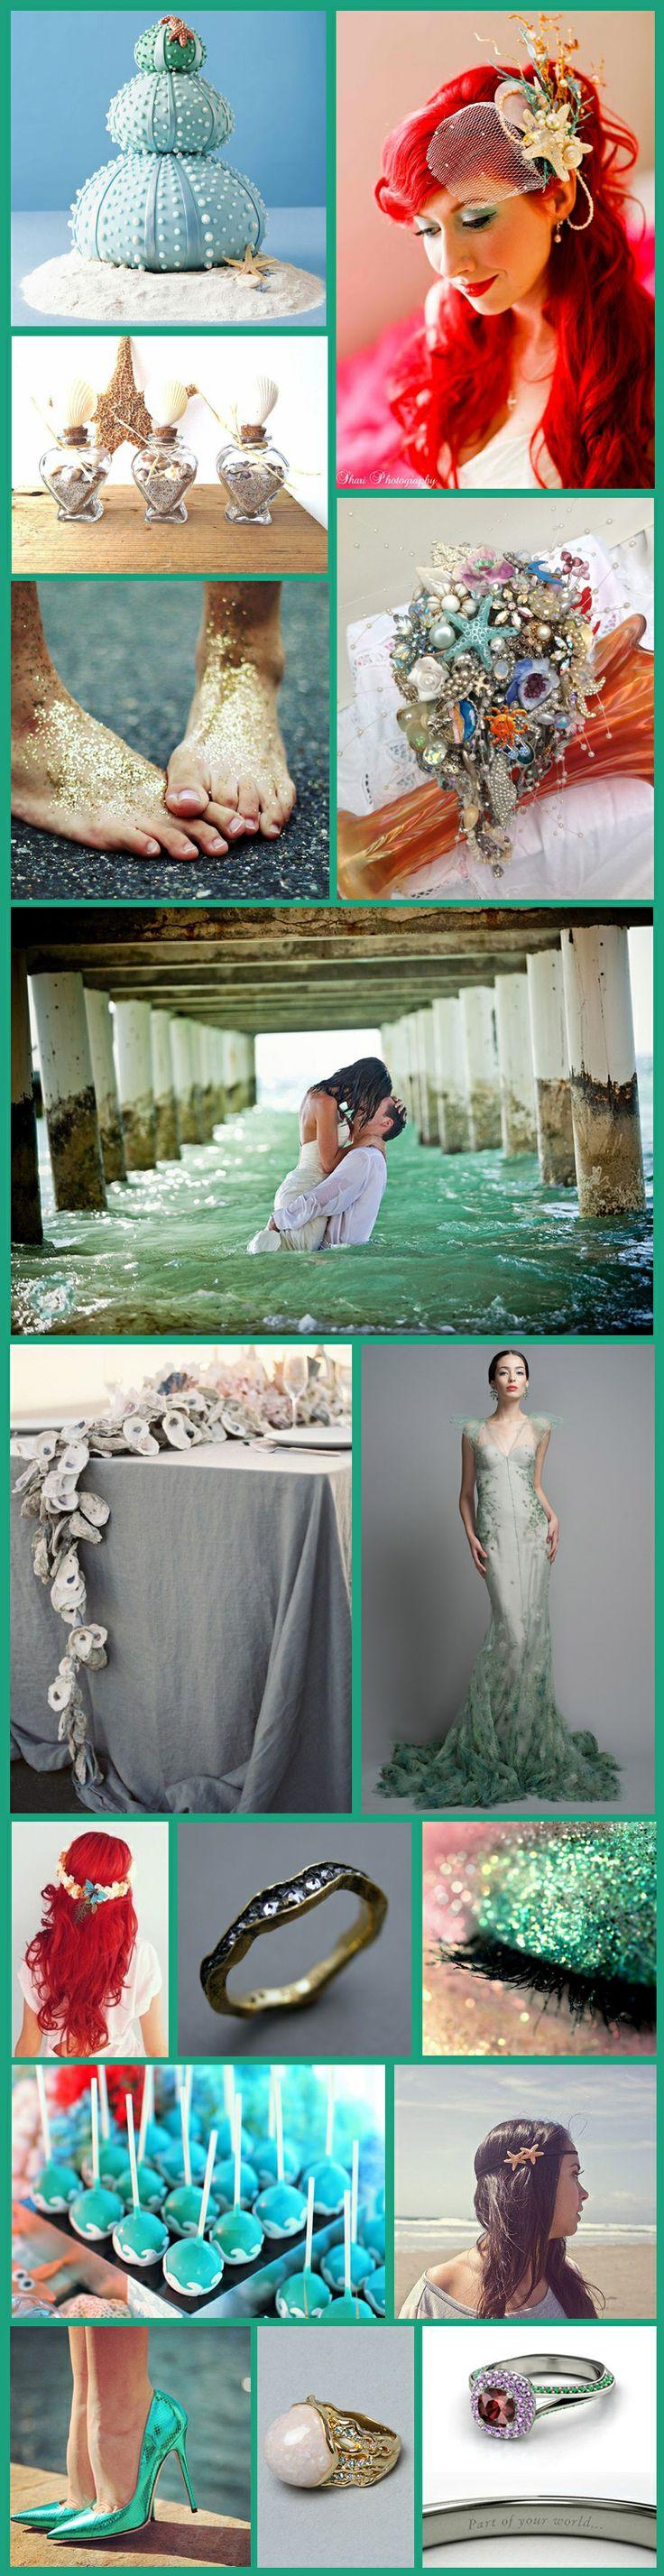 22 best disney themed wedding ideas images on pinterest marriage